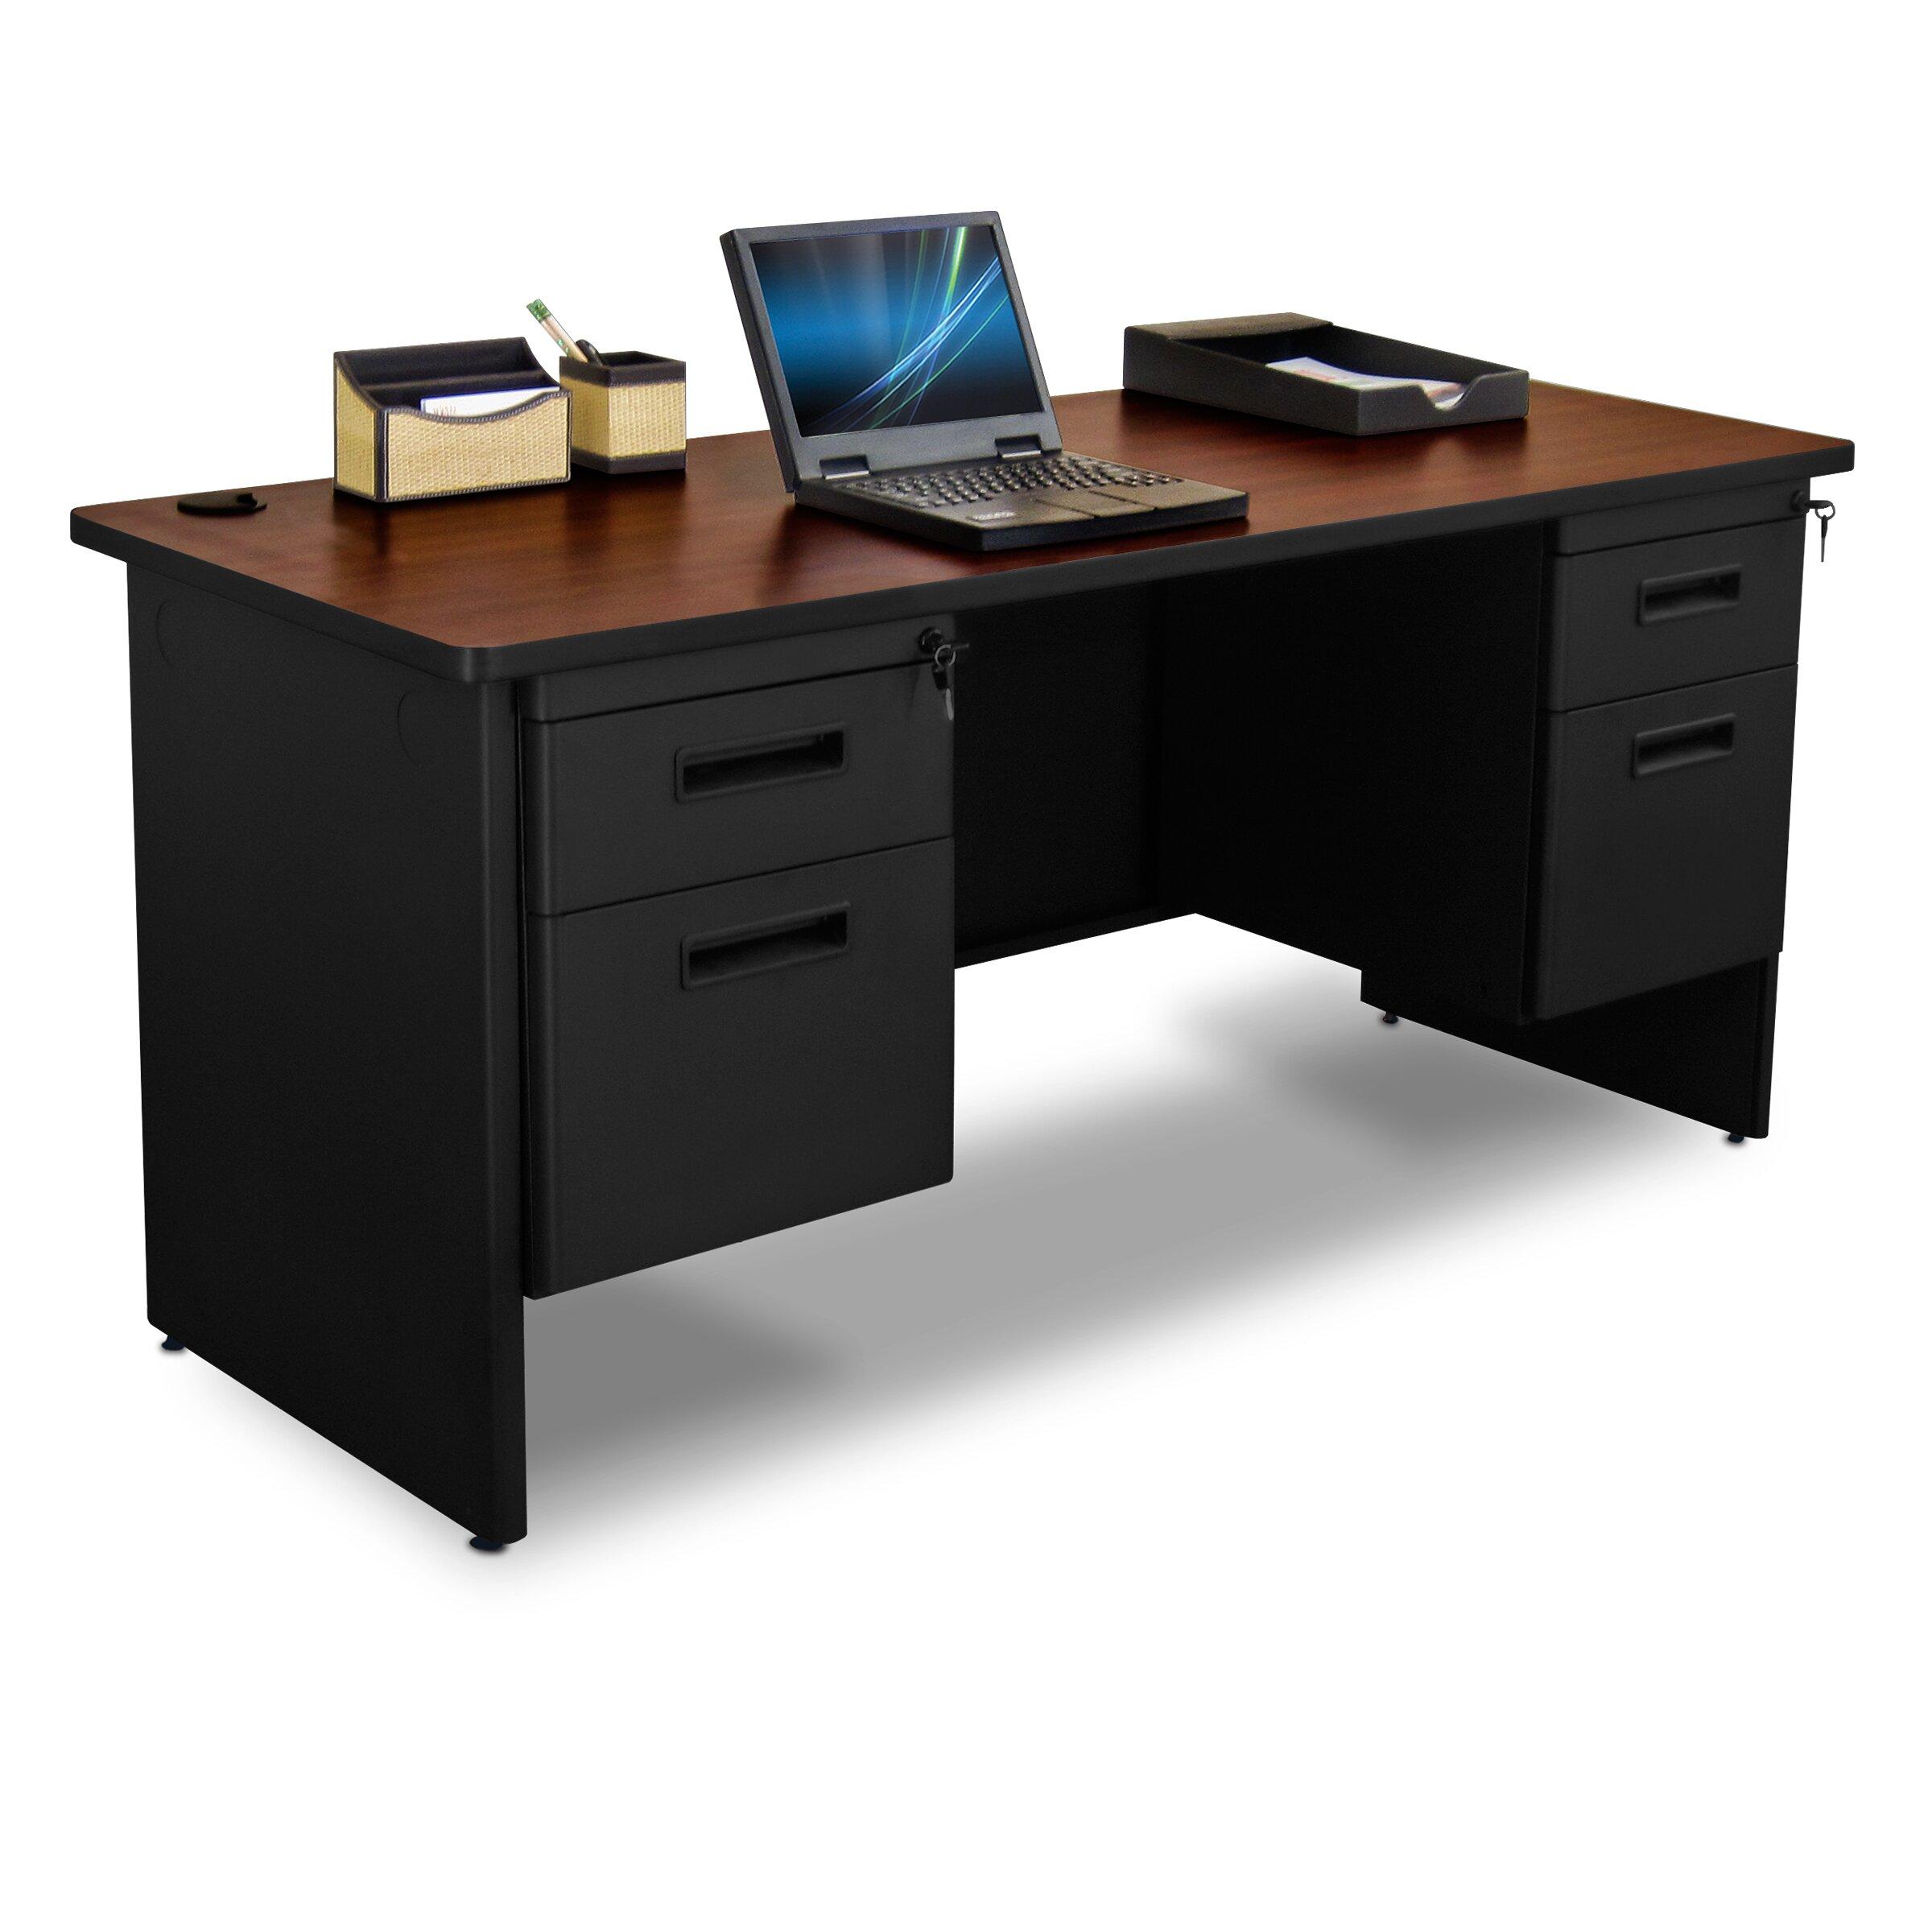 marvel desks images - reverse search